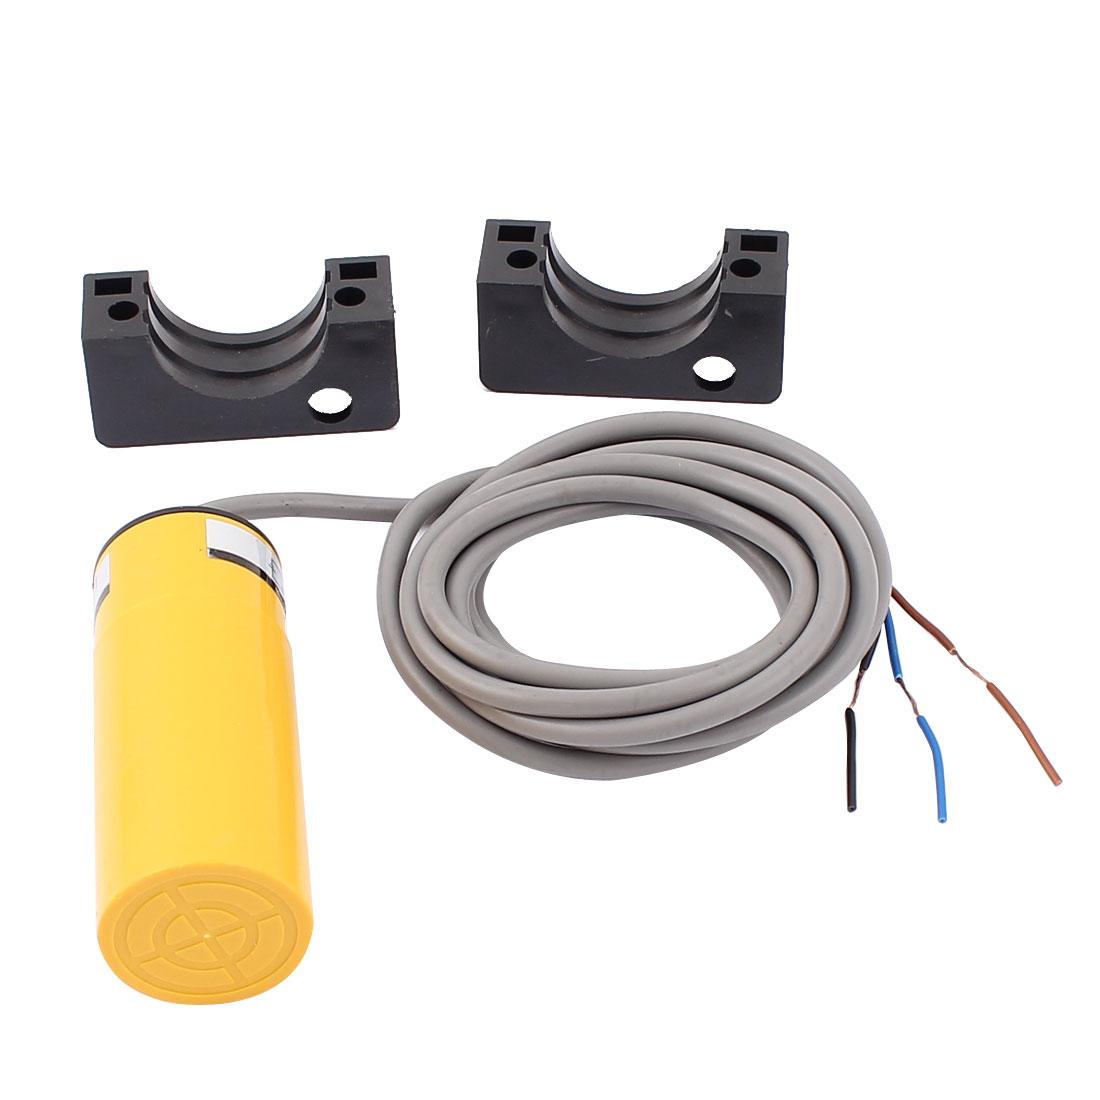 E2K-C25ME1 Inductive Proximity Sensor Detective Control Switch NPN DC 6-36V